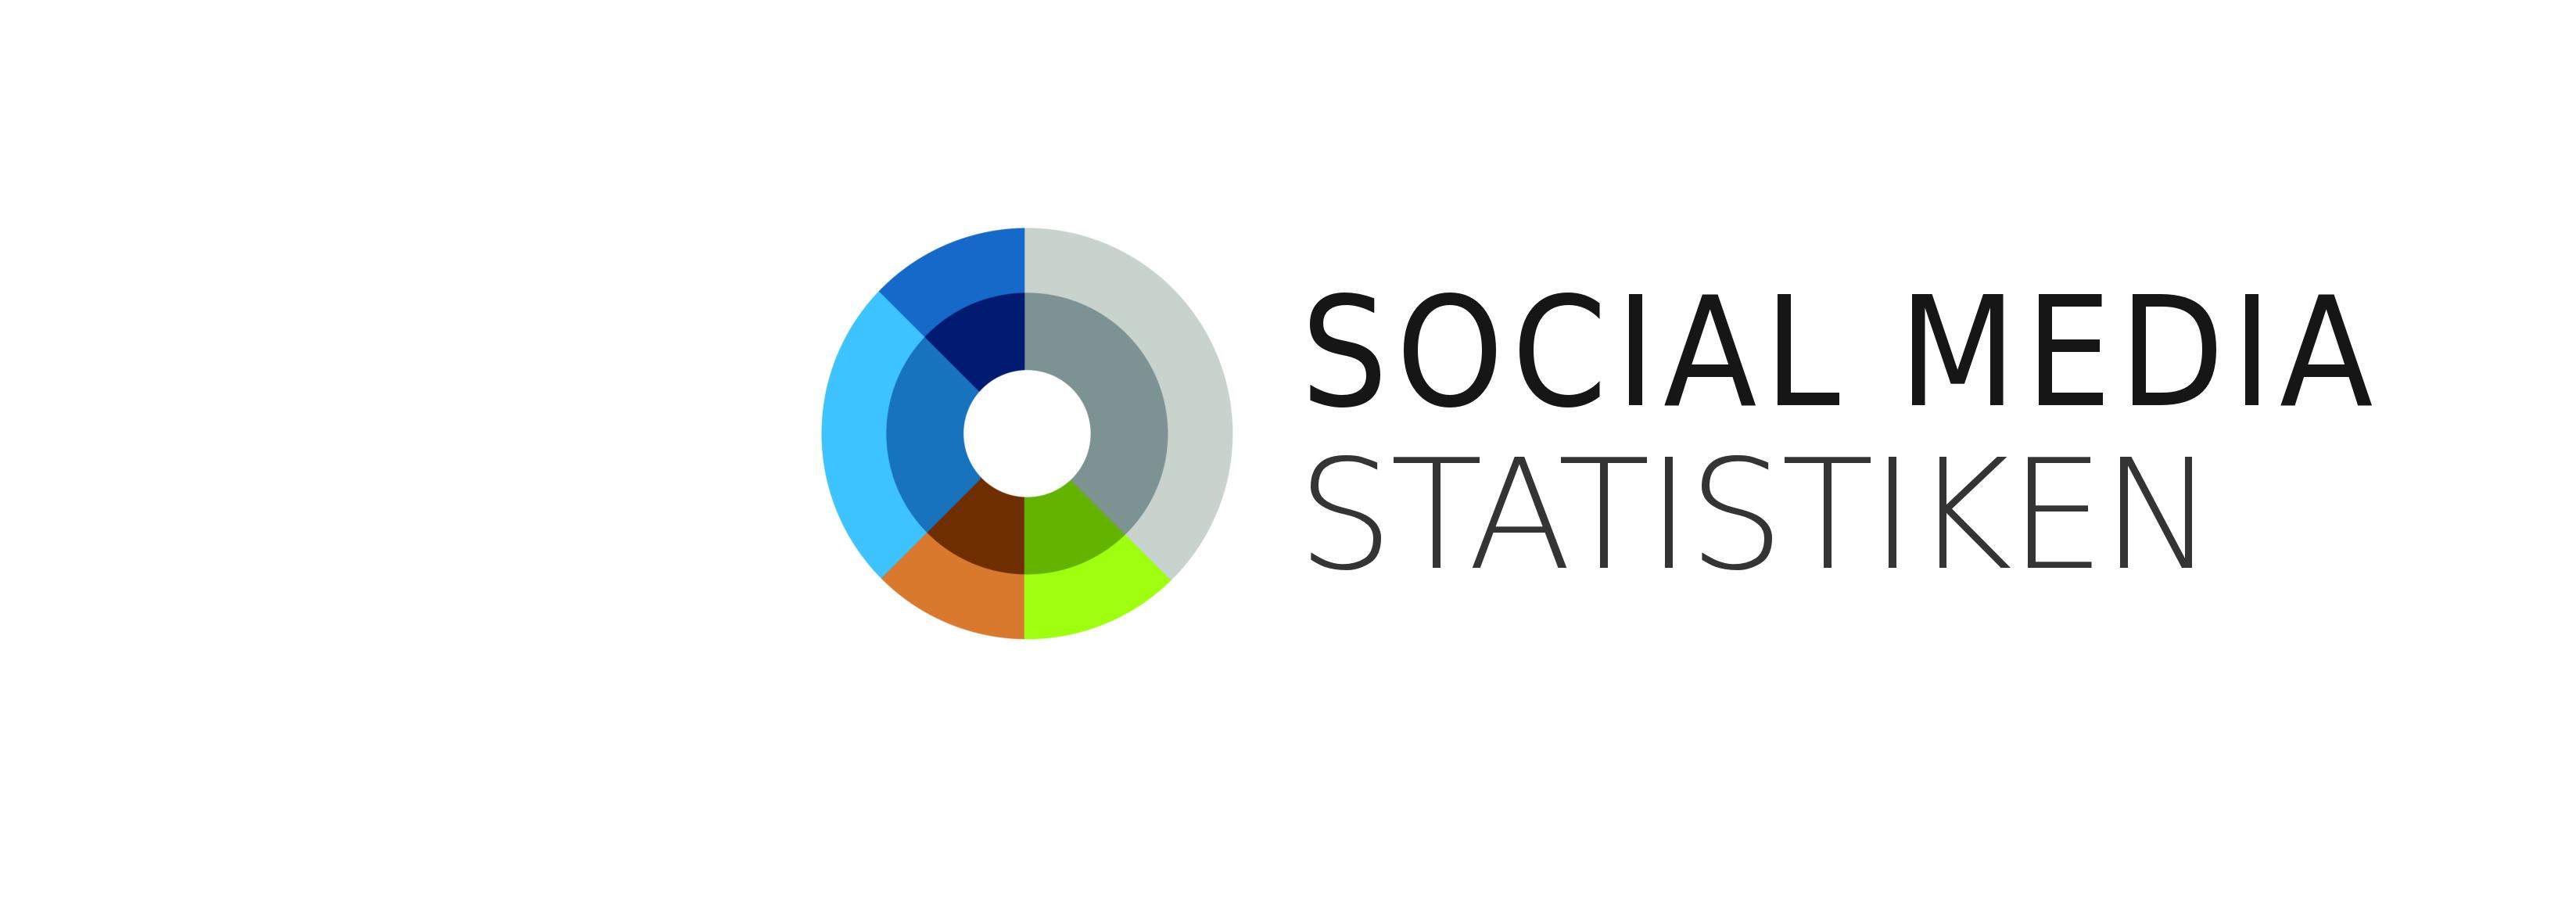 Social Media Statistiken – Über uns und über den Blog